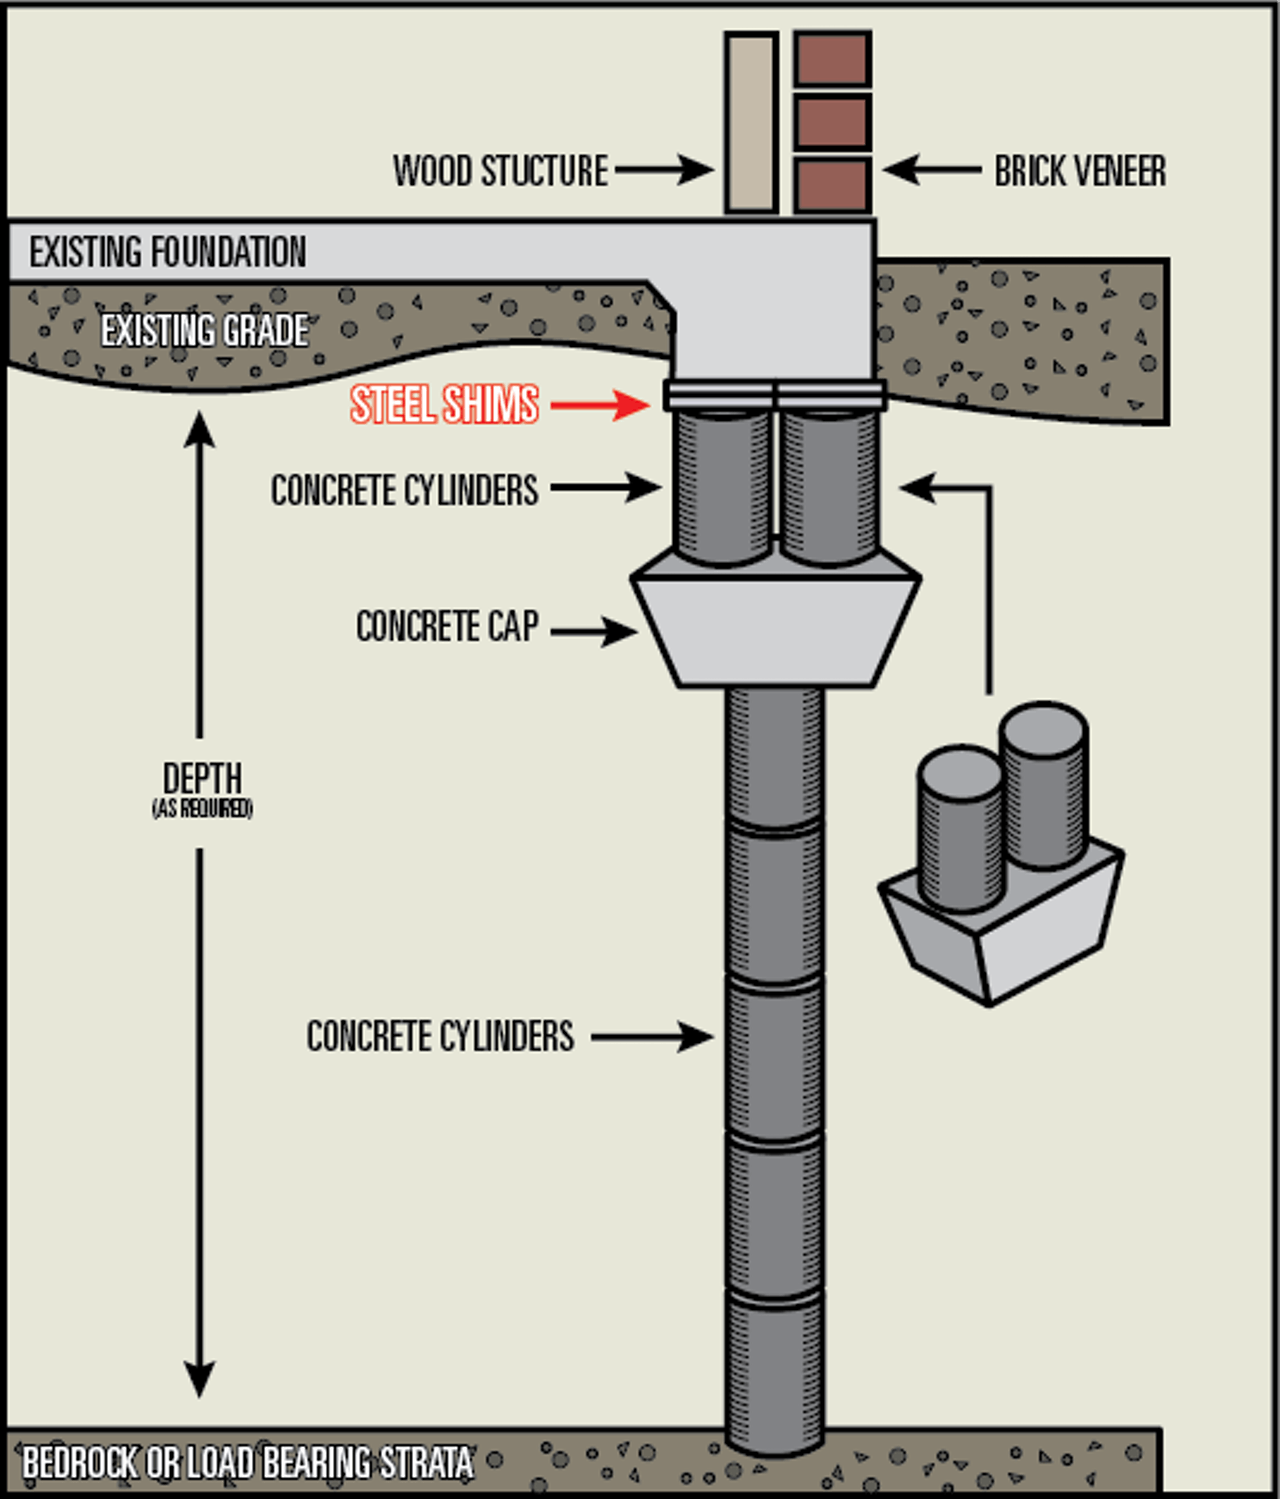 Foundation Shim Illustration